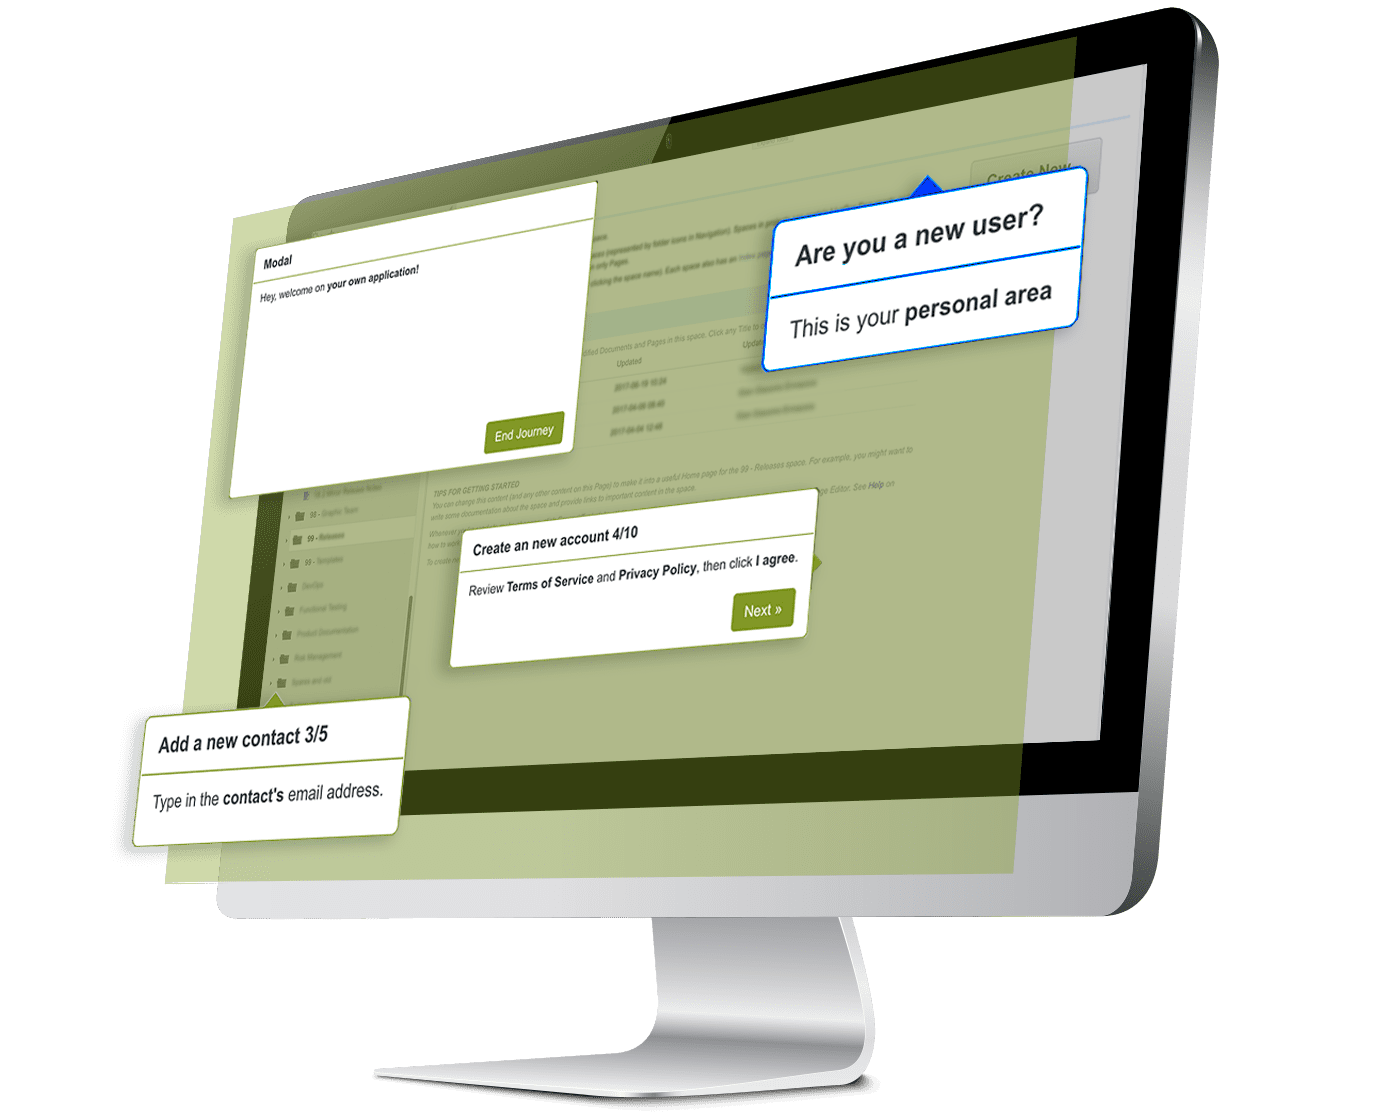 web application tutorial